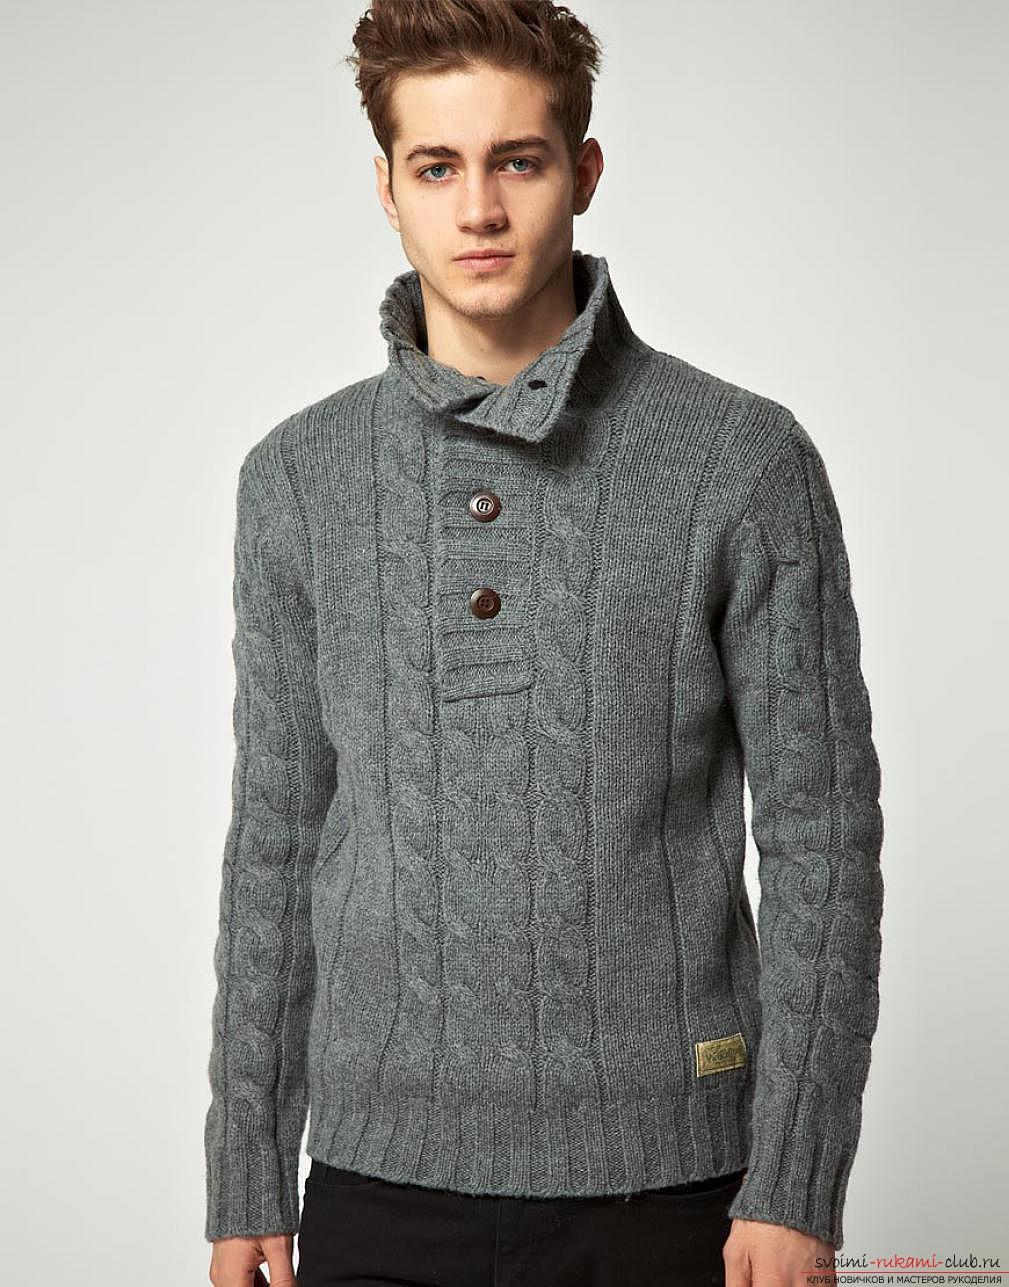 креативный пуловер схема